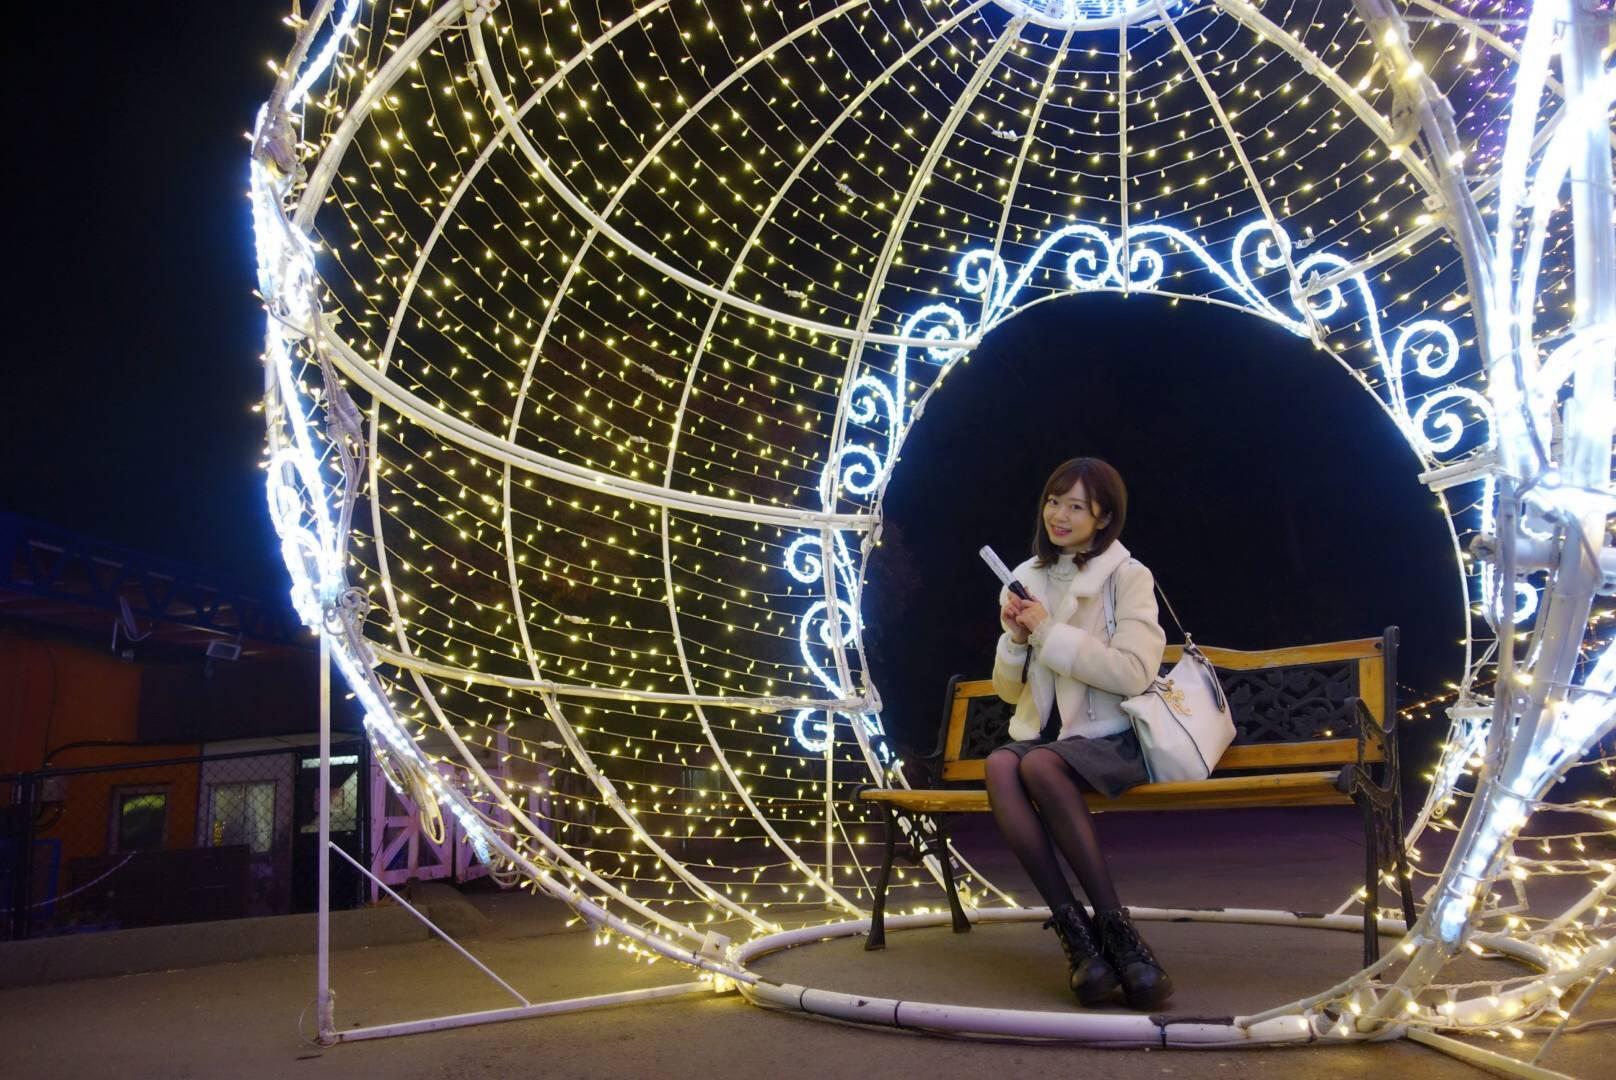 Vol.64♡ 関東最大級!600万級の光の祭典【さがみ湖イルミリオン】_1_6-3